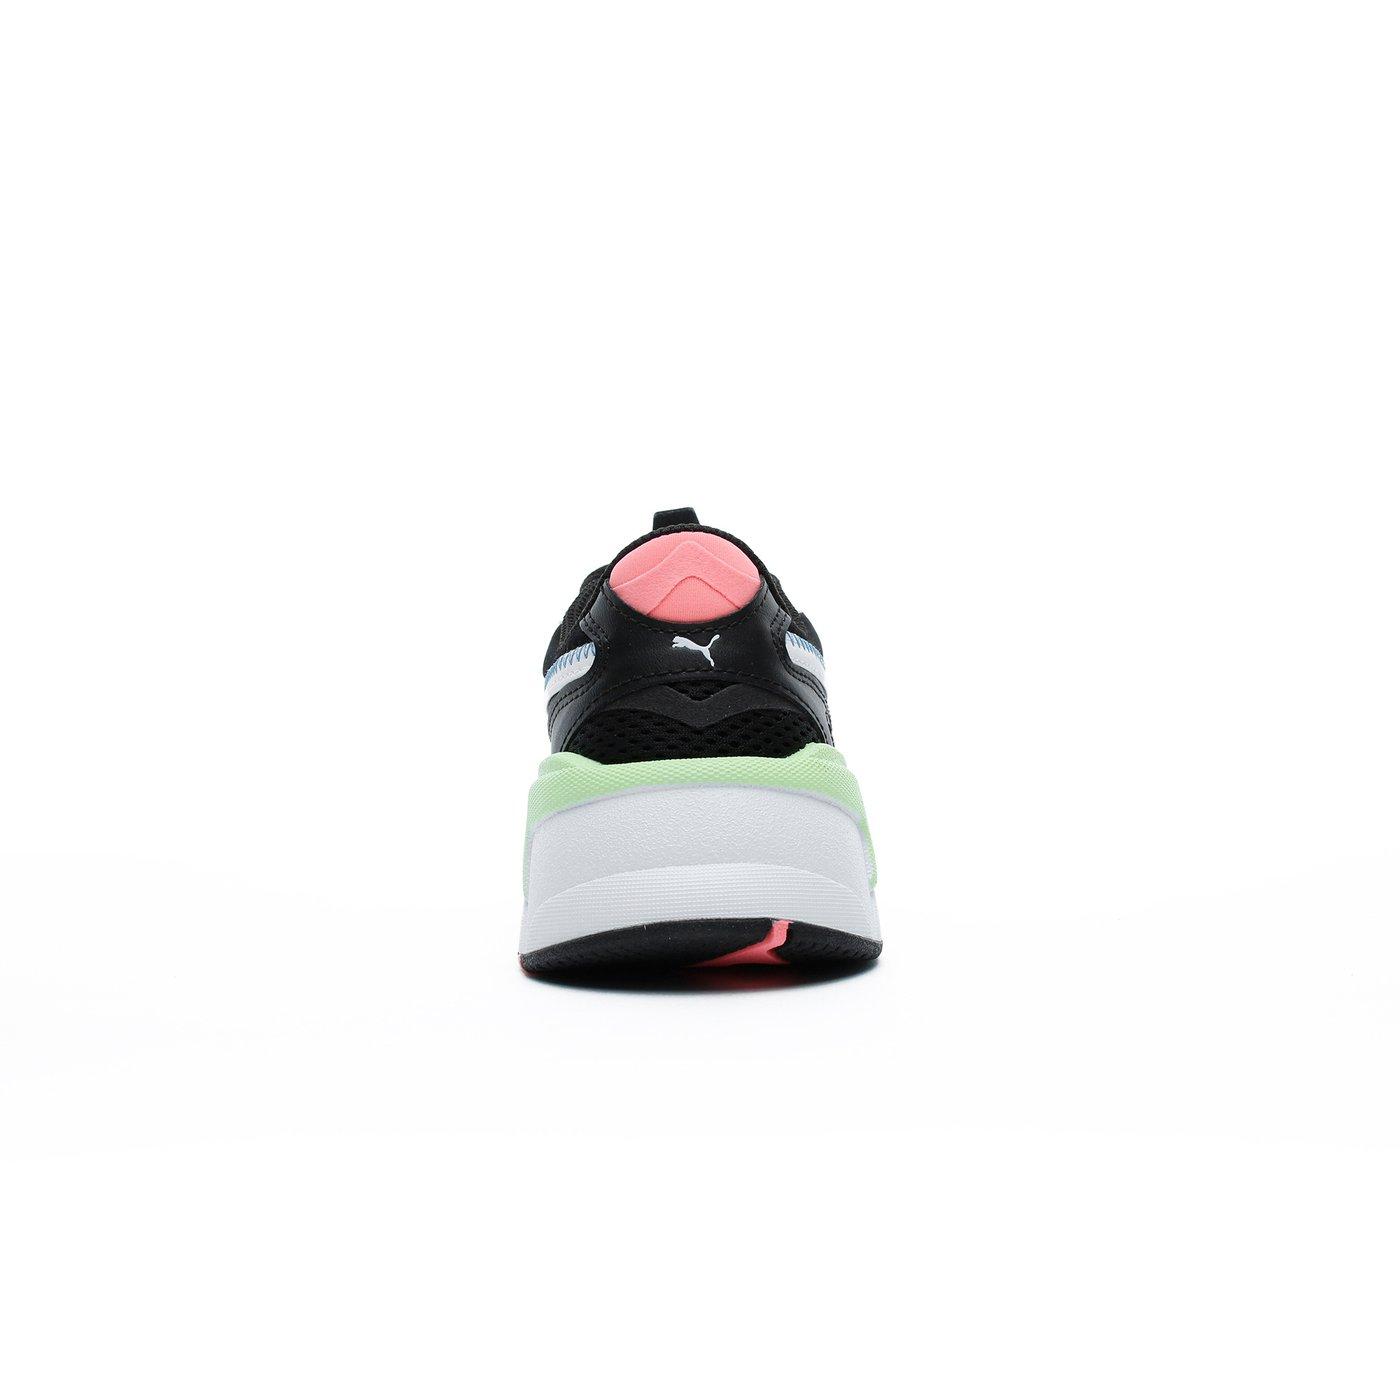 RS-X³ 00 OG Unisex Siyah Spor Ayakkabı